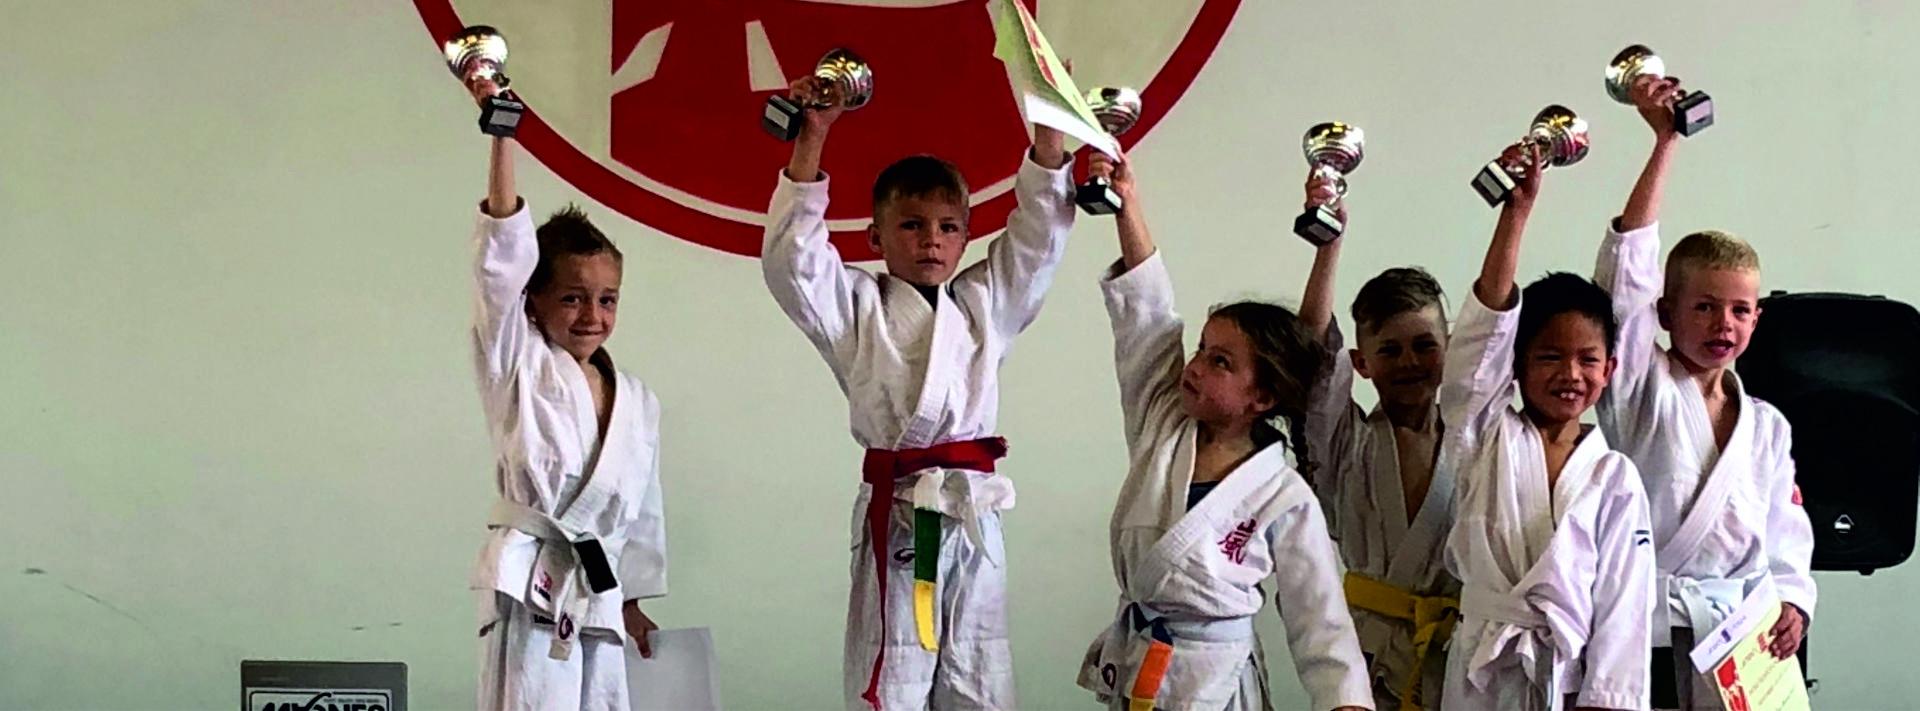 Judo Yushi Puntencompetitie